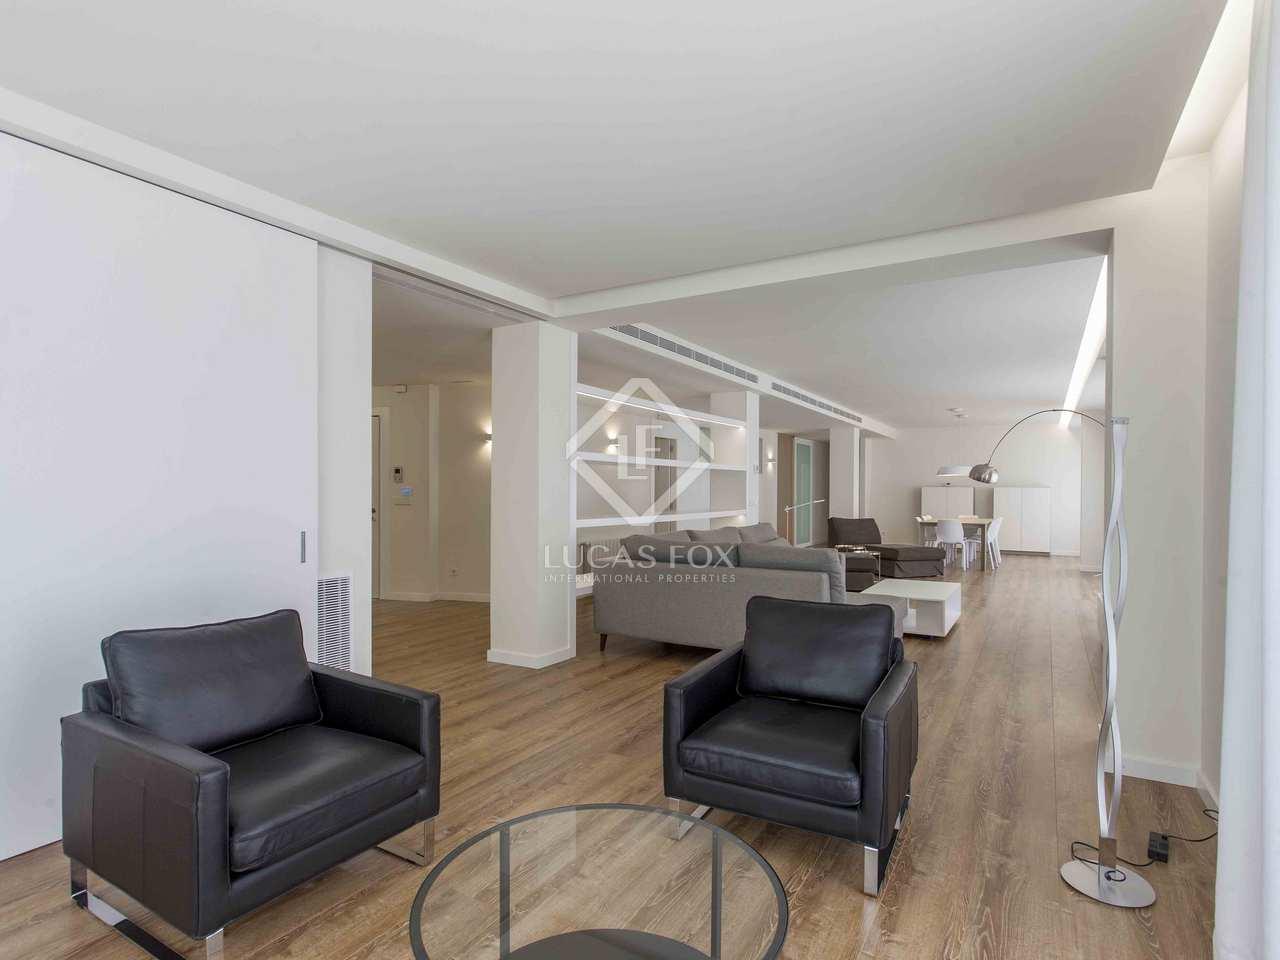 Appartement A Louer Valence Espagne